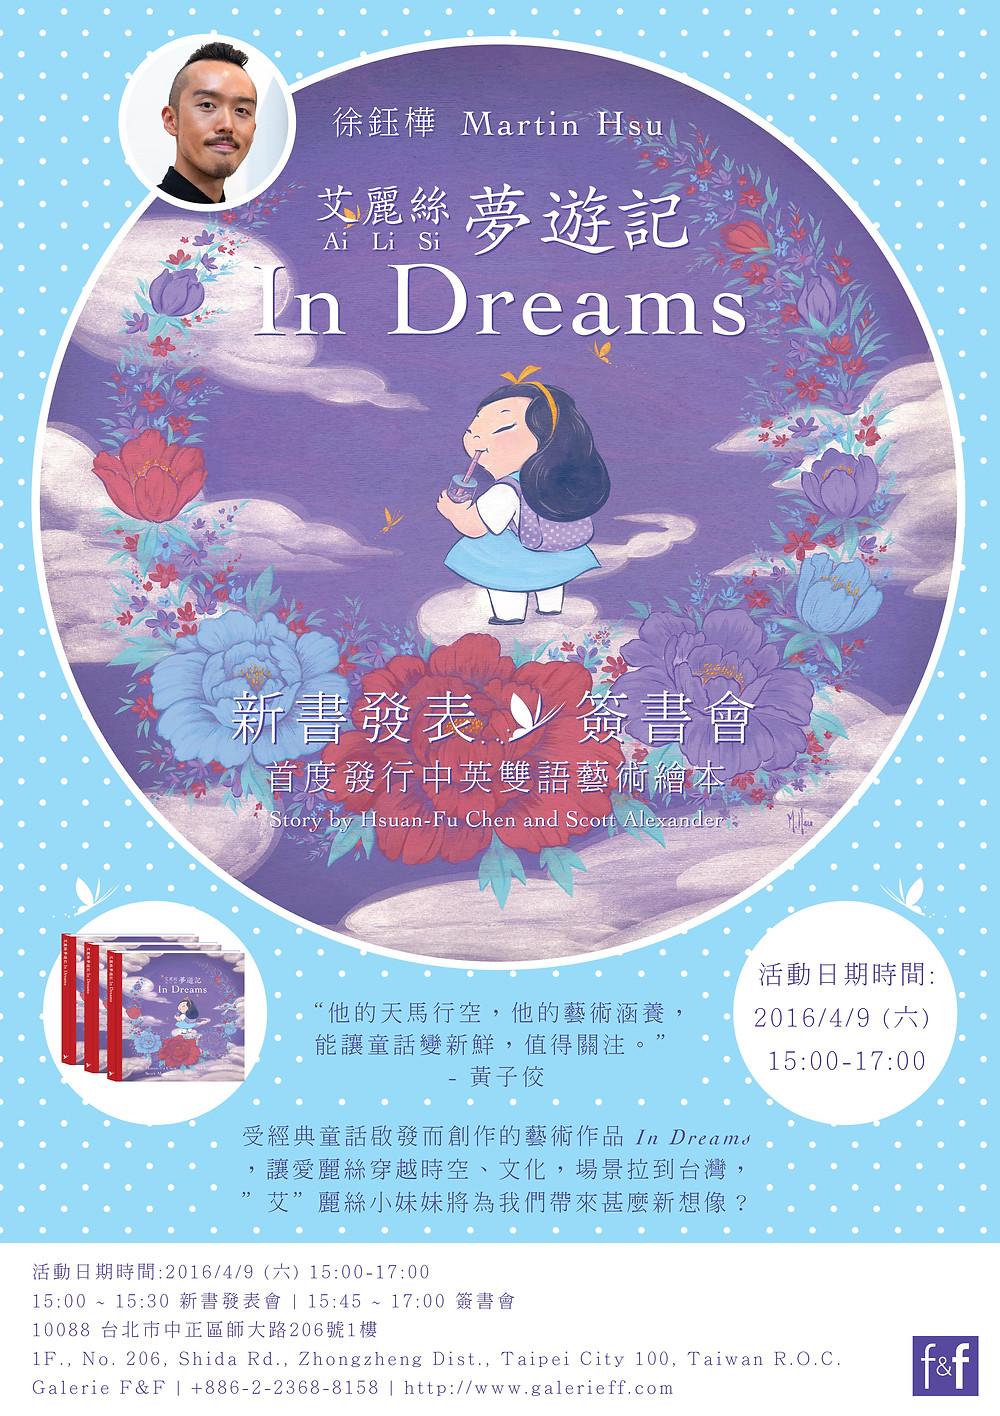 徐鈺樺 Martin Hsu 艾麗絲夢遊記 In Dreams 新書發表 @Galerie F&F